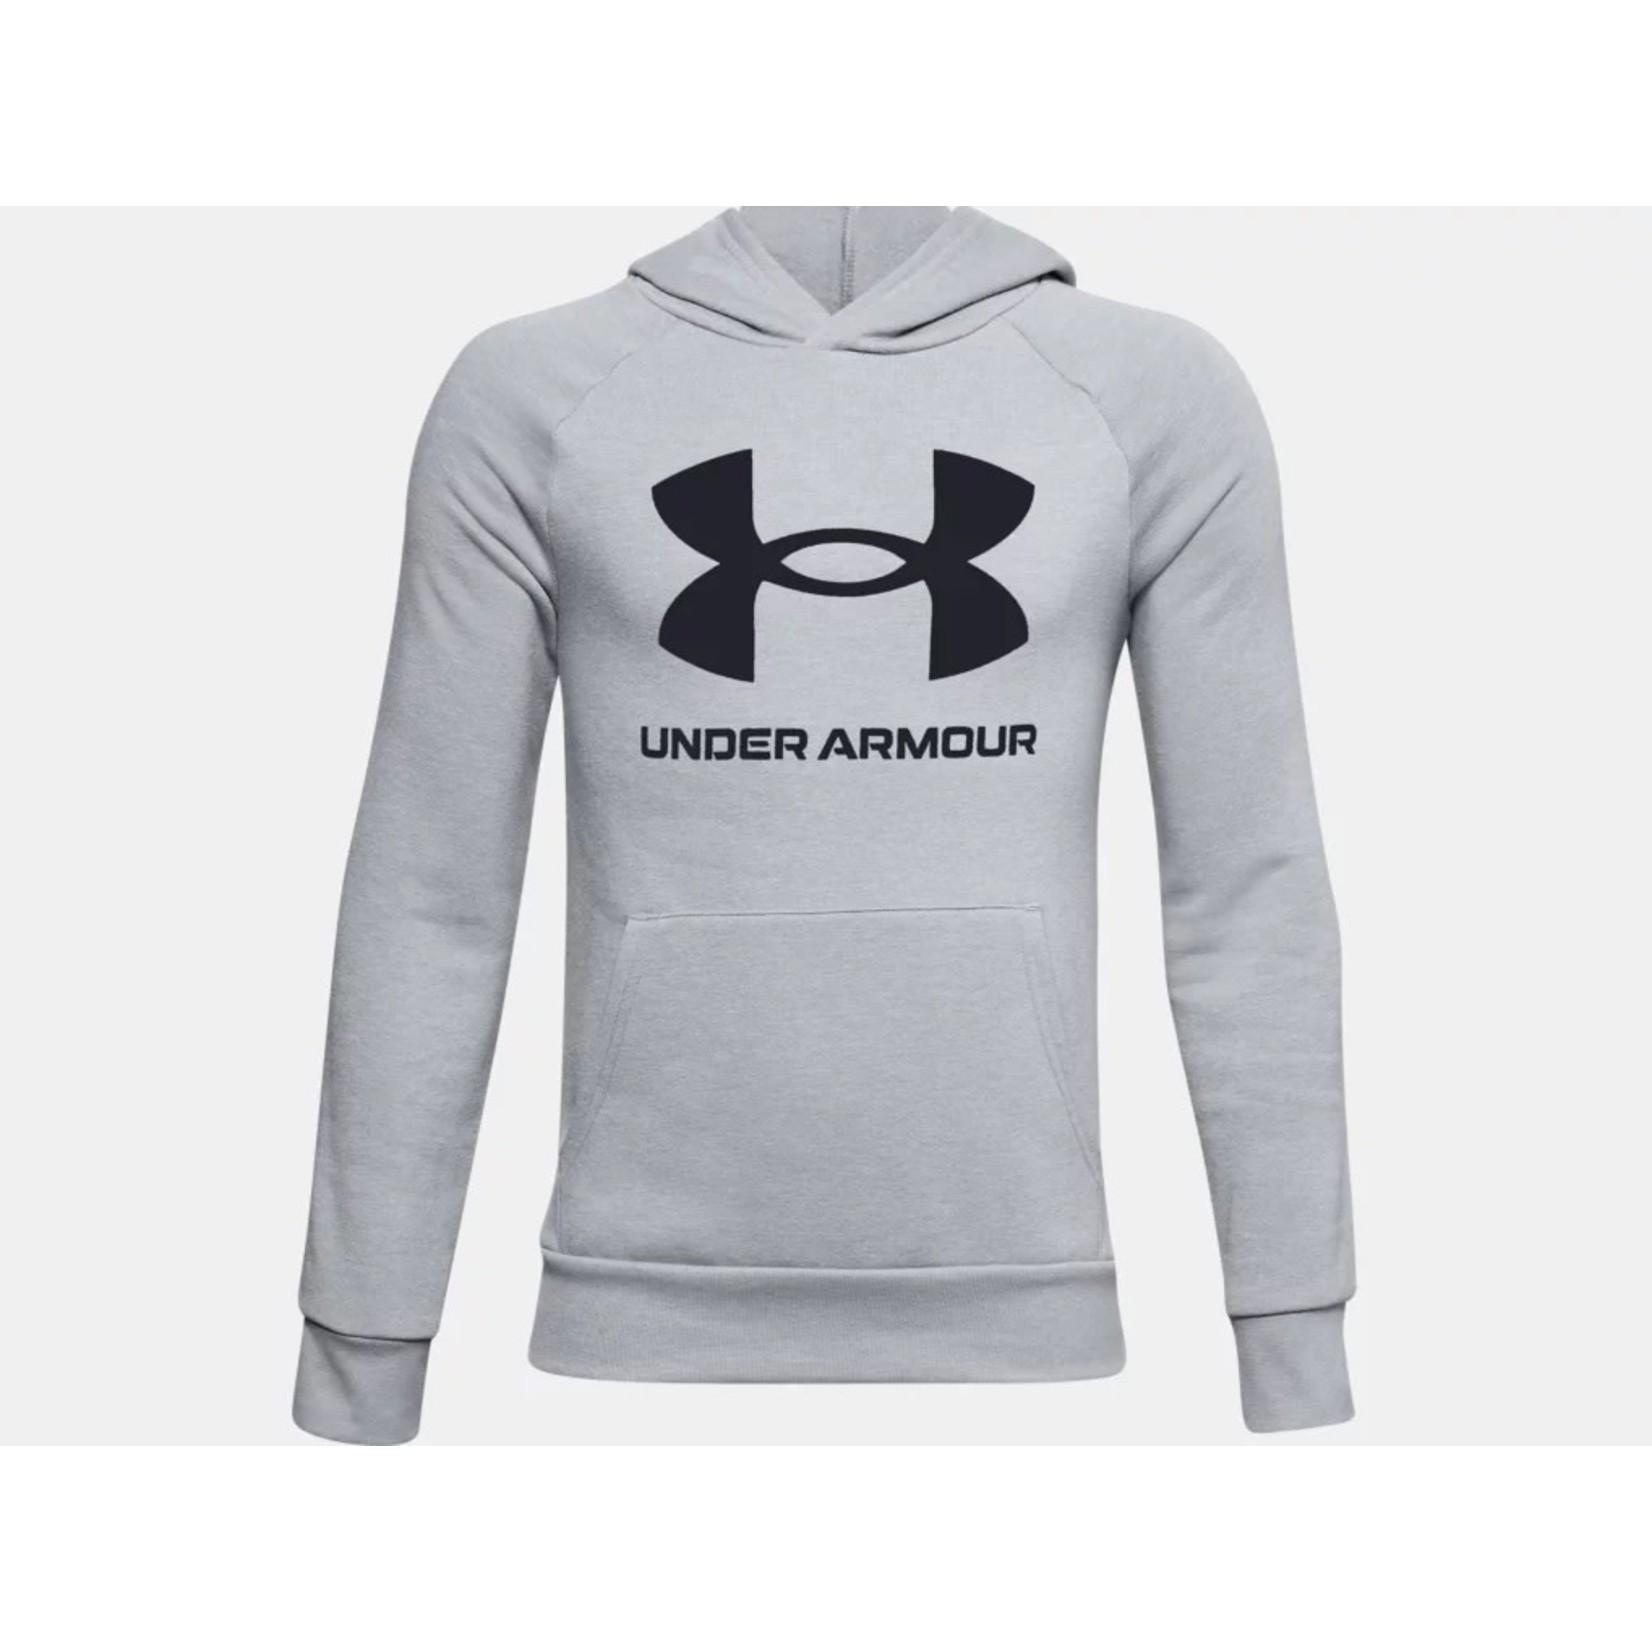 Under Armour Under Armour Hoodie, Rival Fleece Big Logo, Boys